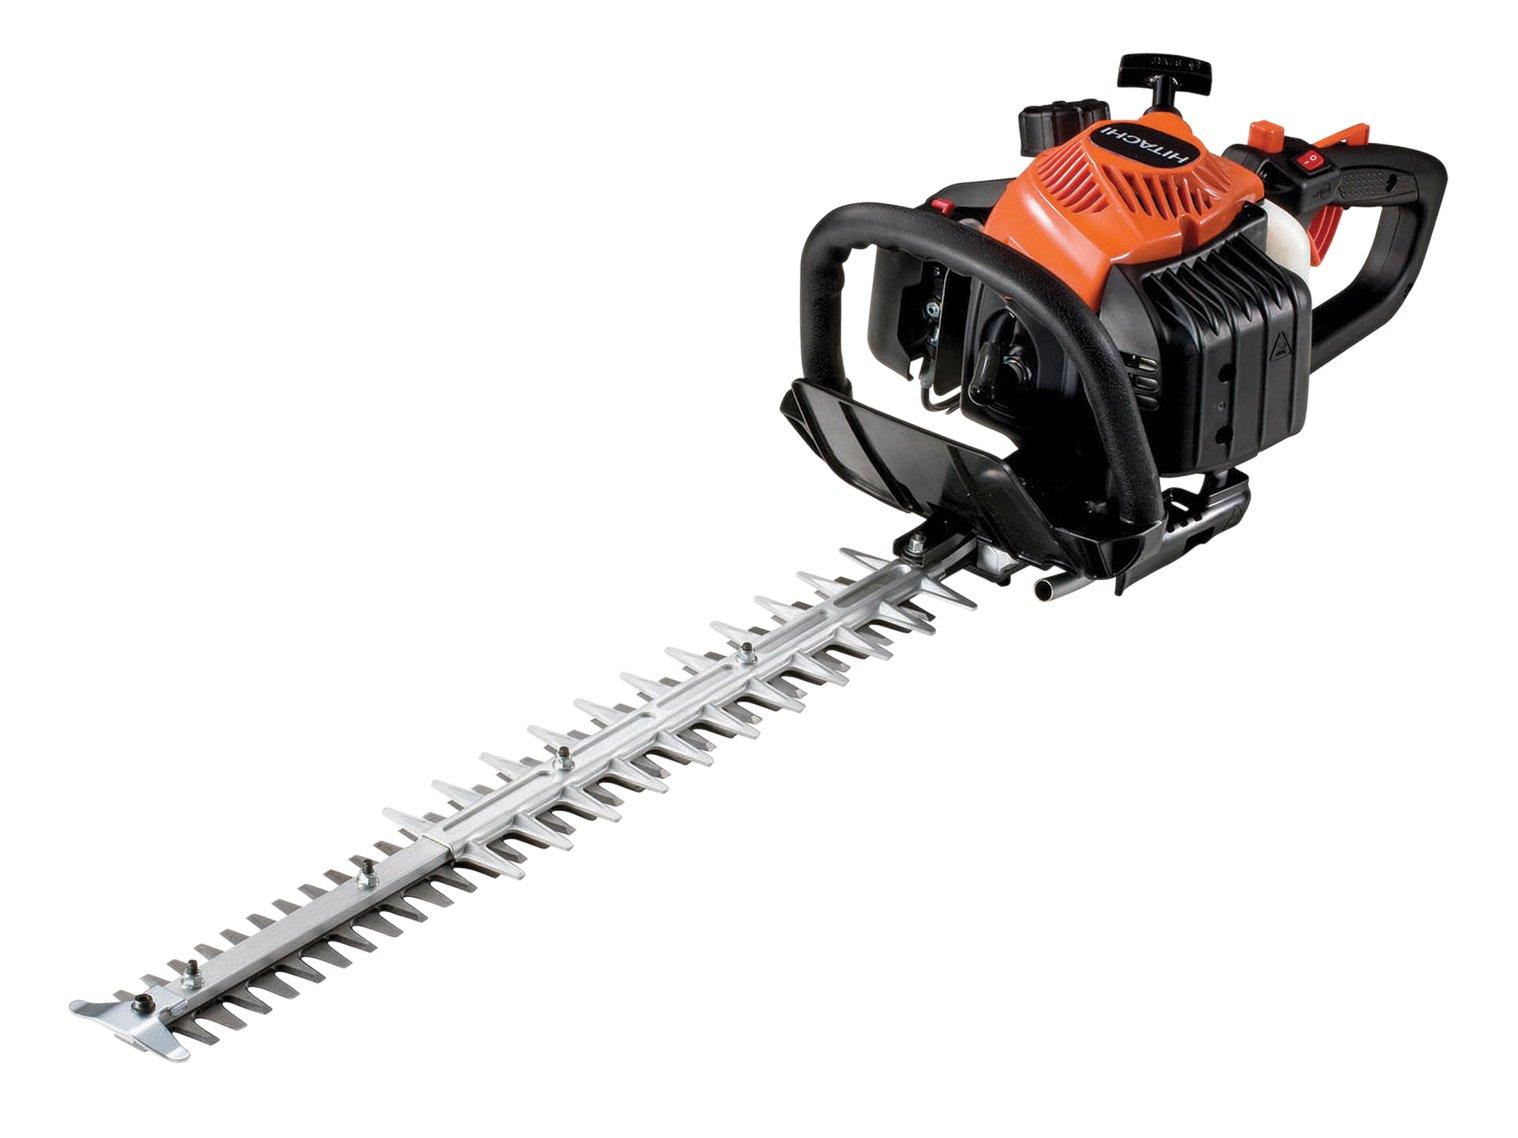 CH22EBP2 Petrol Hedge Trimmer 620mm 21.1cc